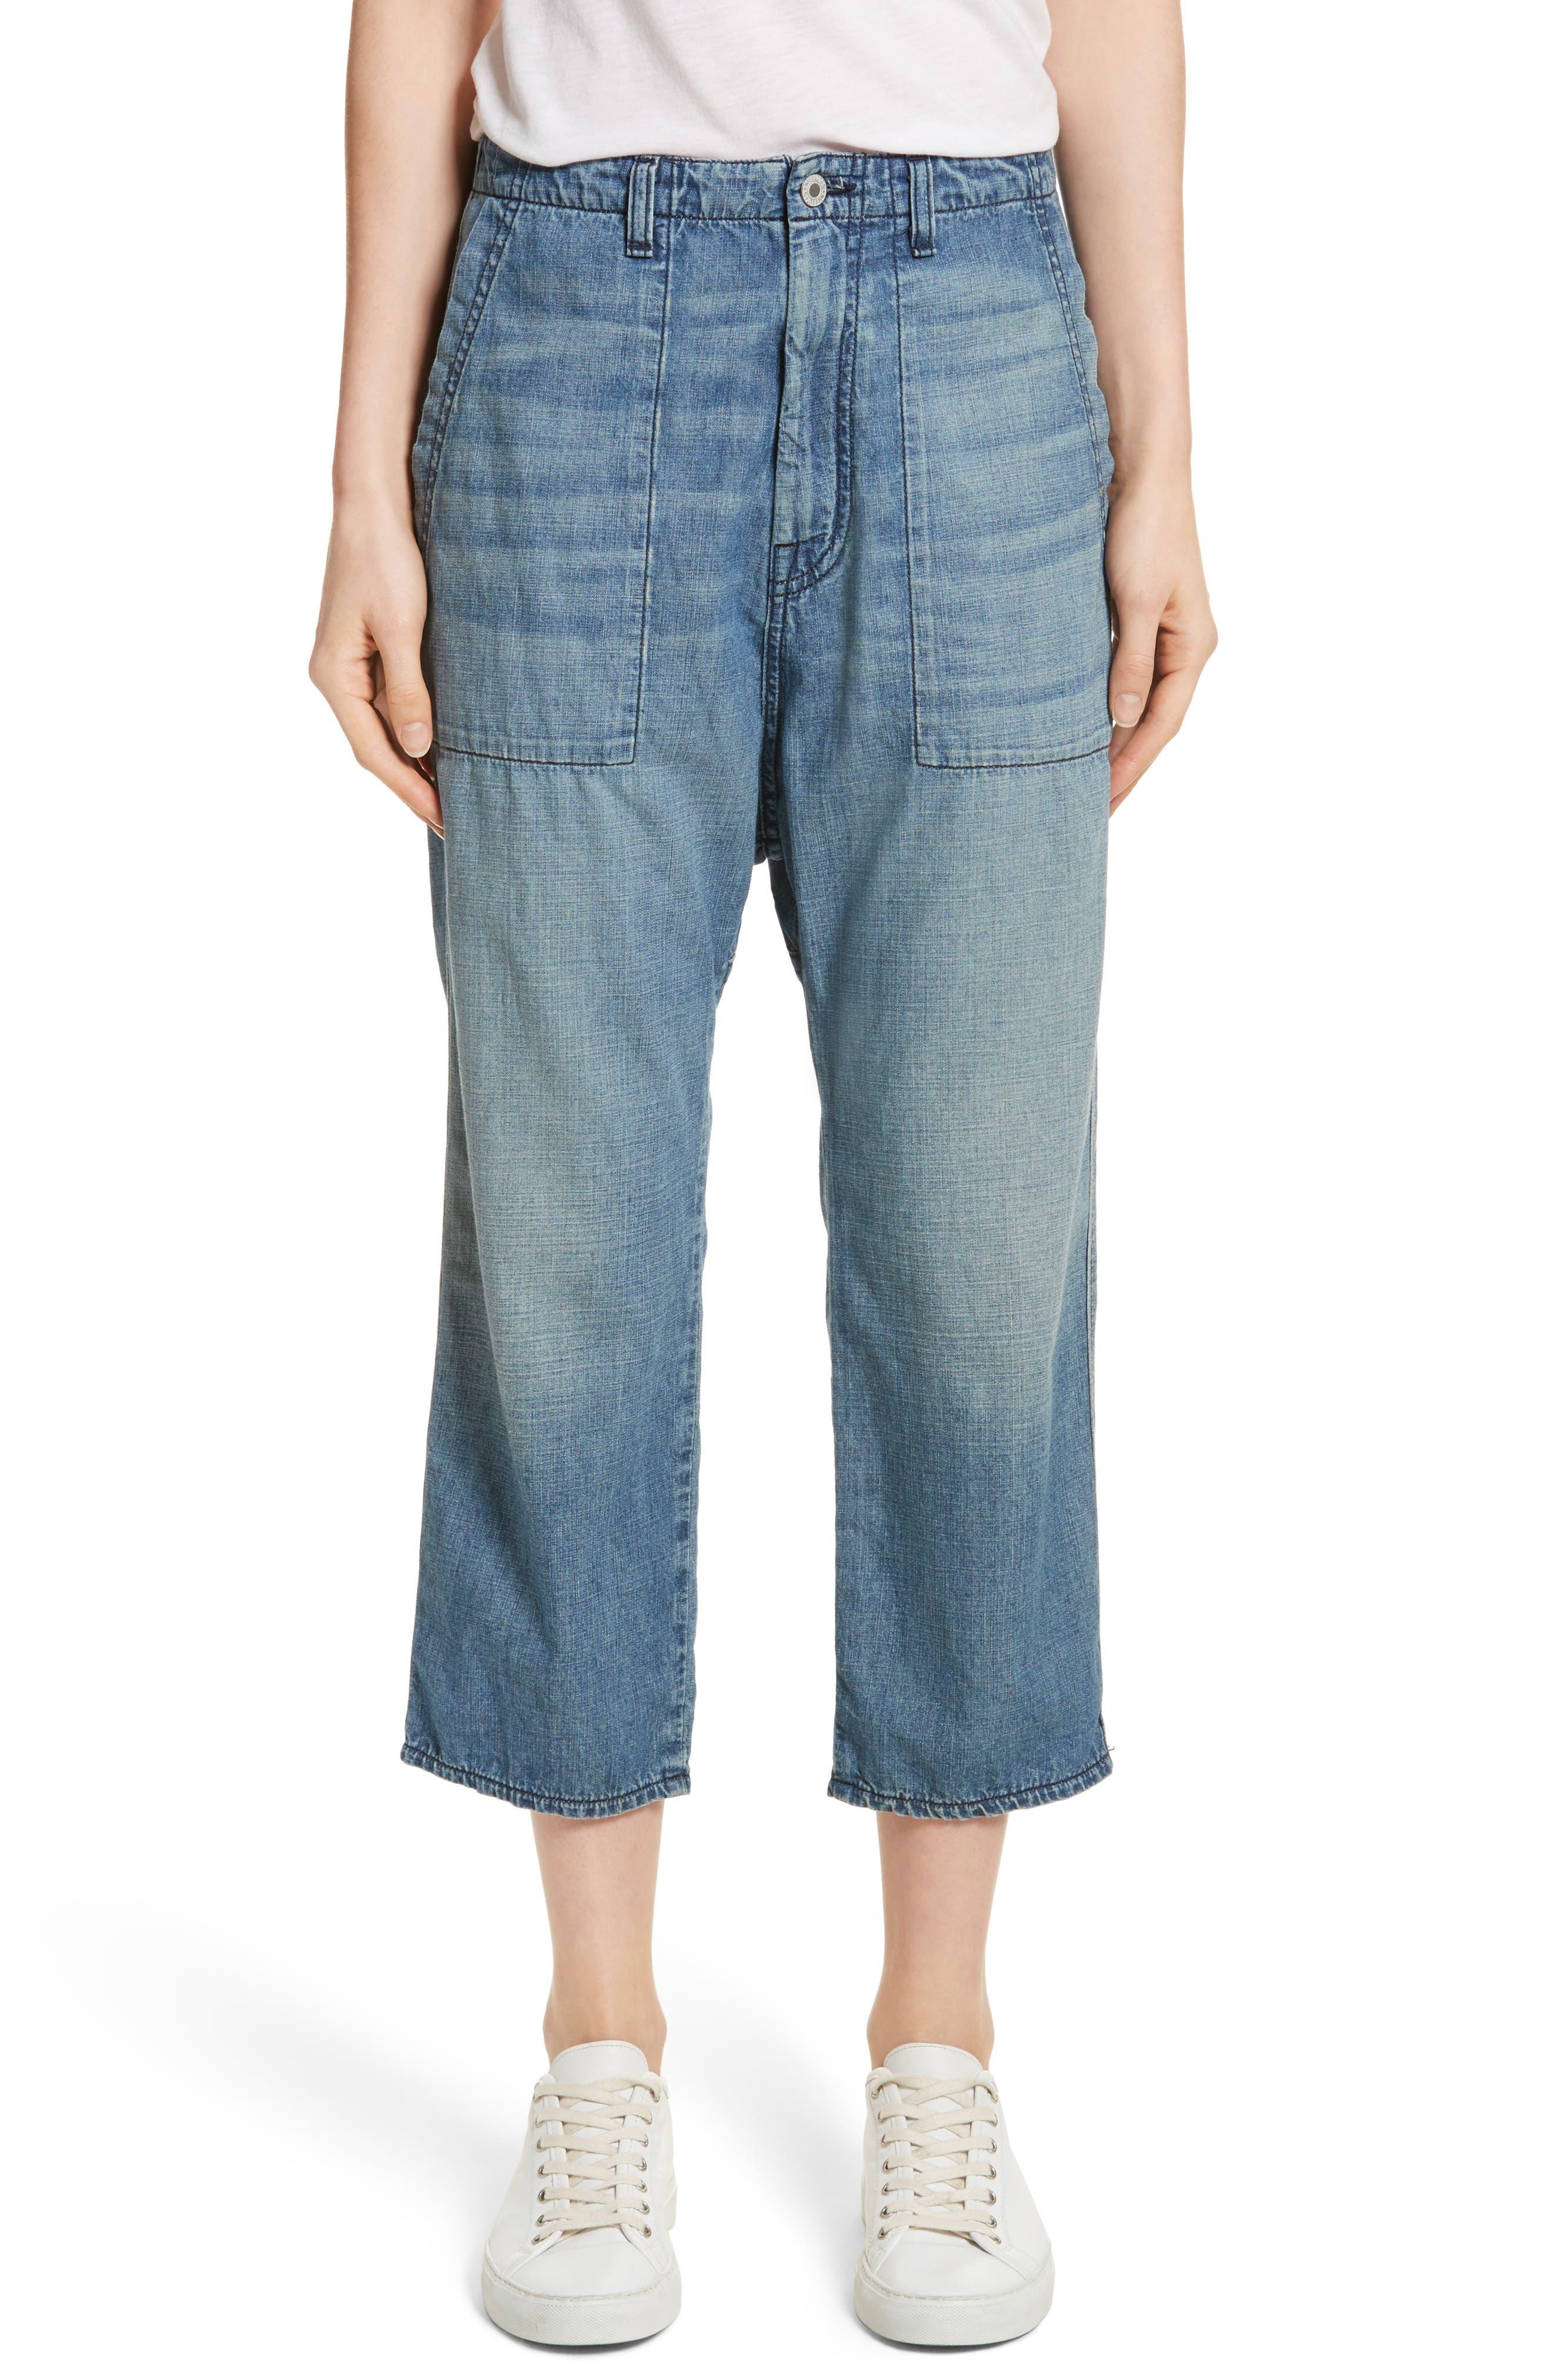 Nili Lotan Luna Crop Jeans (Sunset)